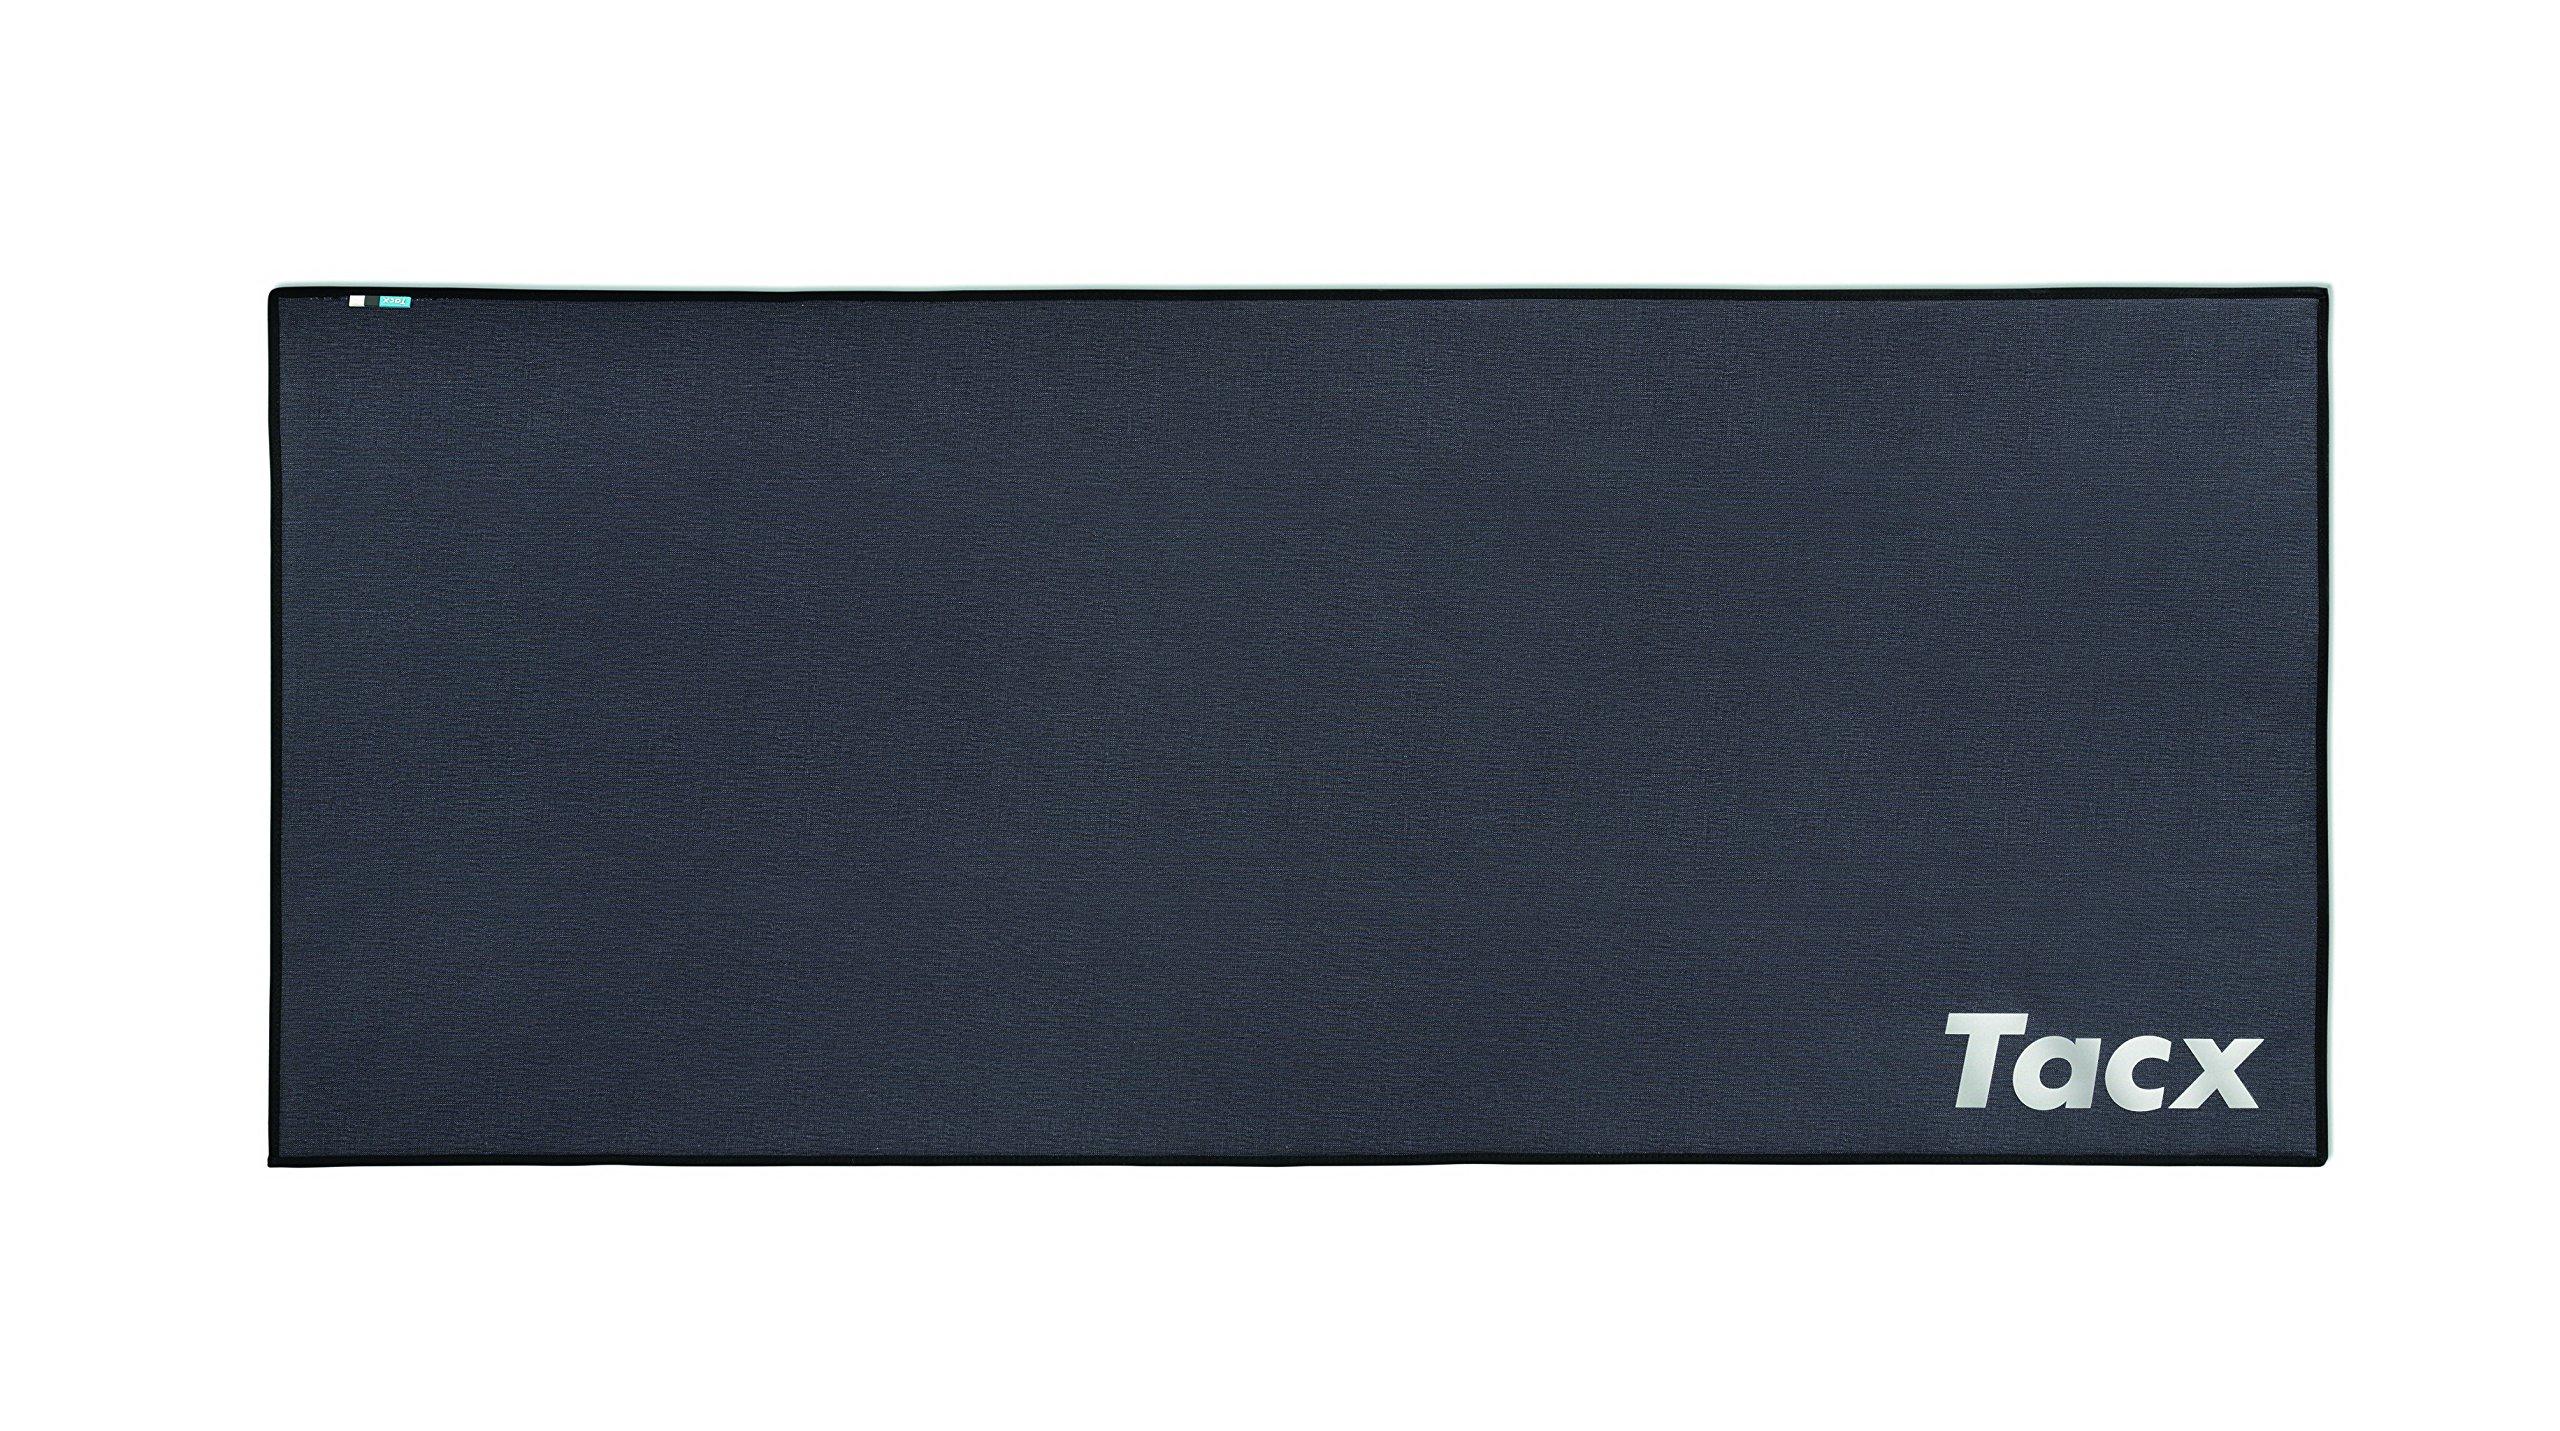 Tacx Folding Training Mat